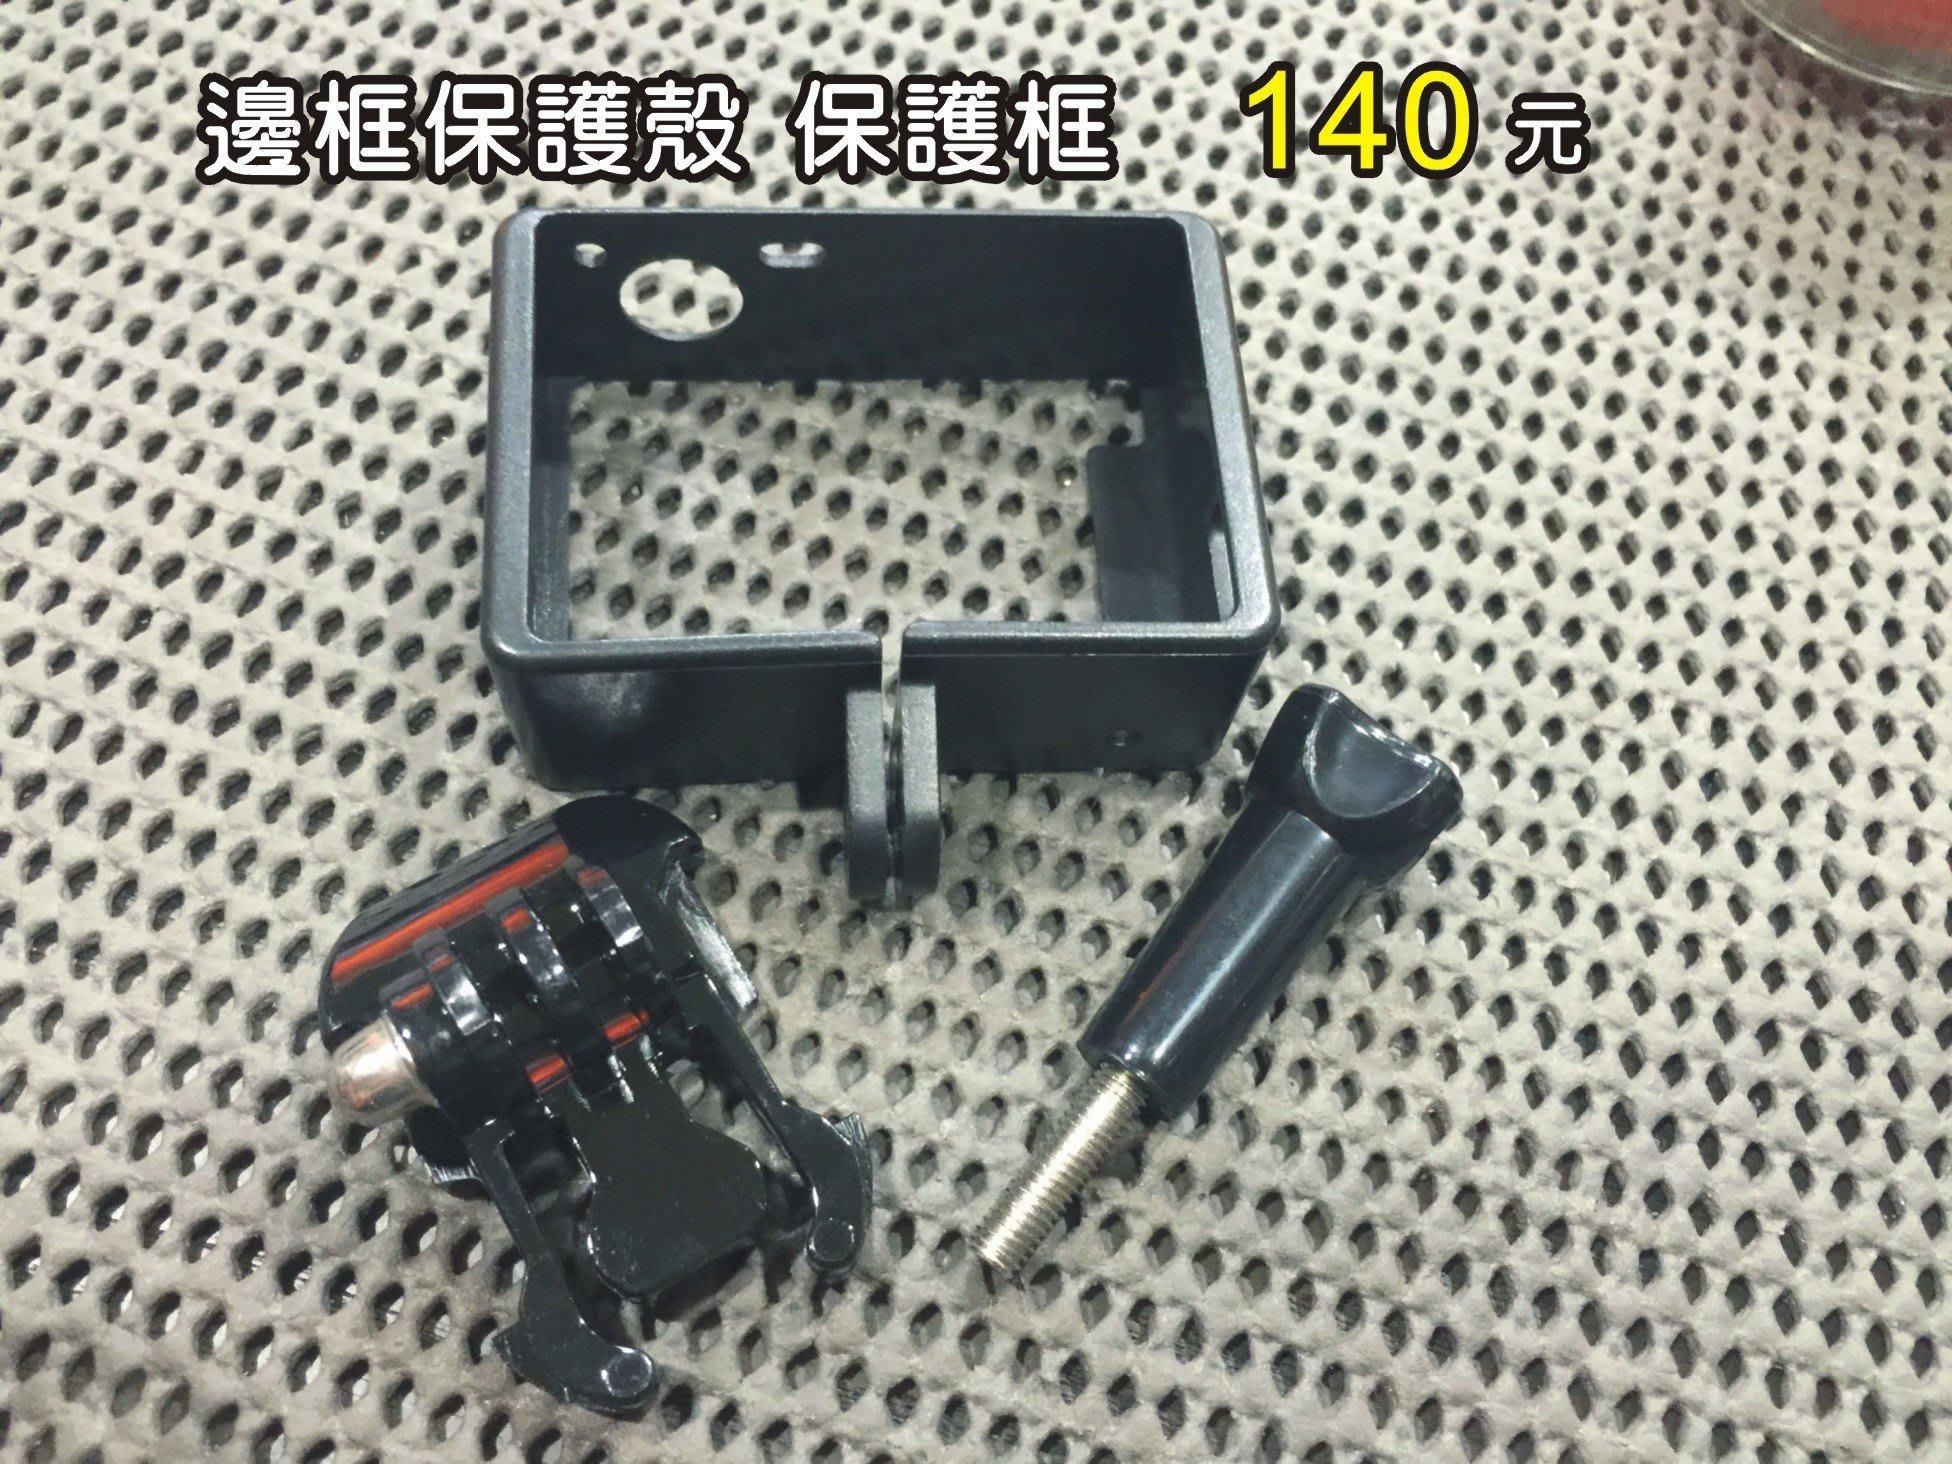 5mj.tw GOPRO 易拆式外框固定架 固定鎖 金屬框 hero4 hero3 多角度固定組iphone 6s也可夾